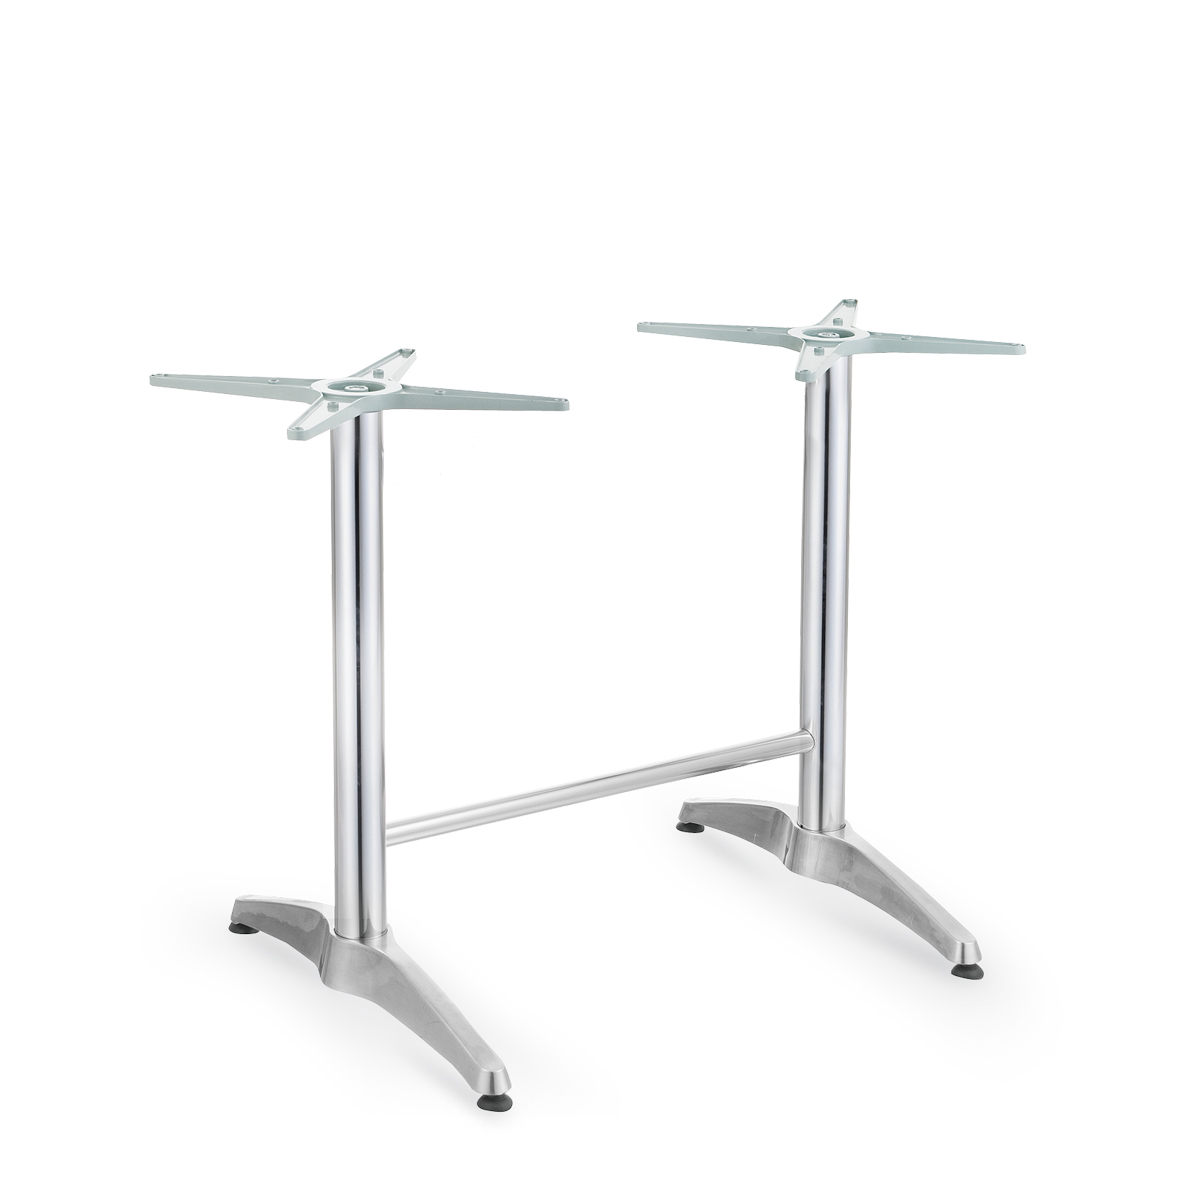 Atb 003 aluminium dining base tabletops furniture for Table exterieur aluminium anodise